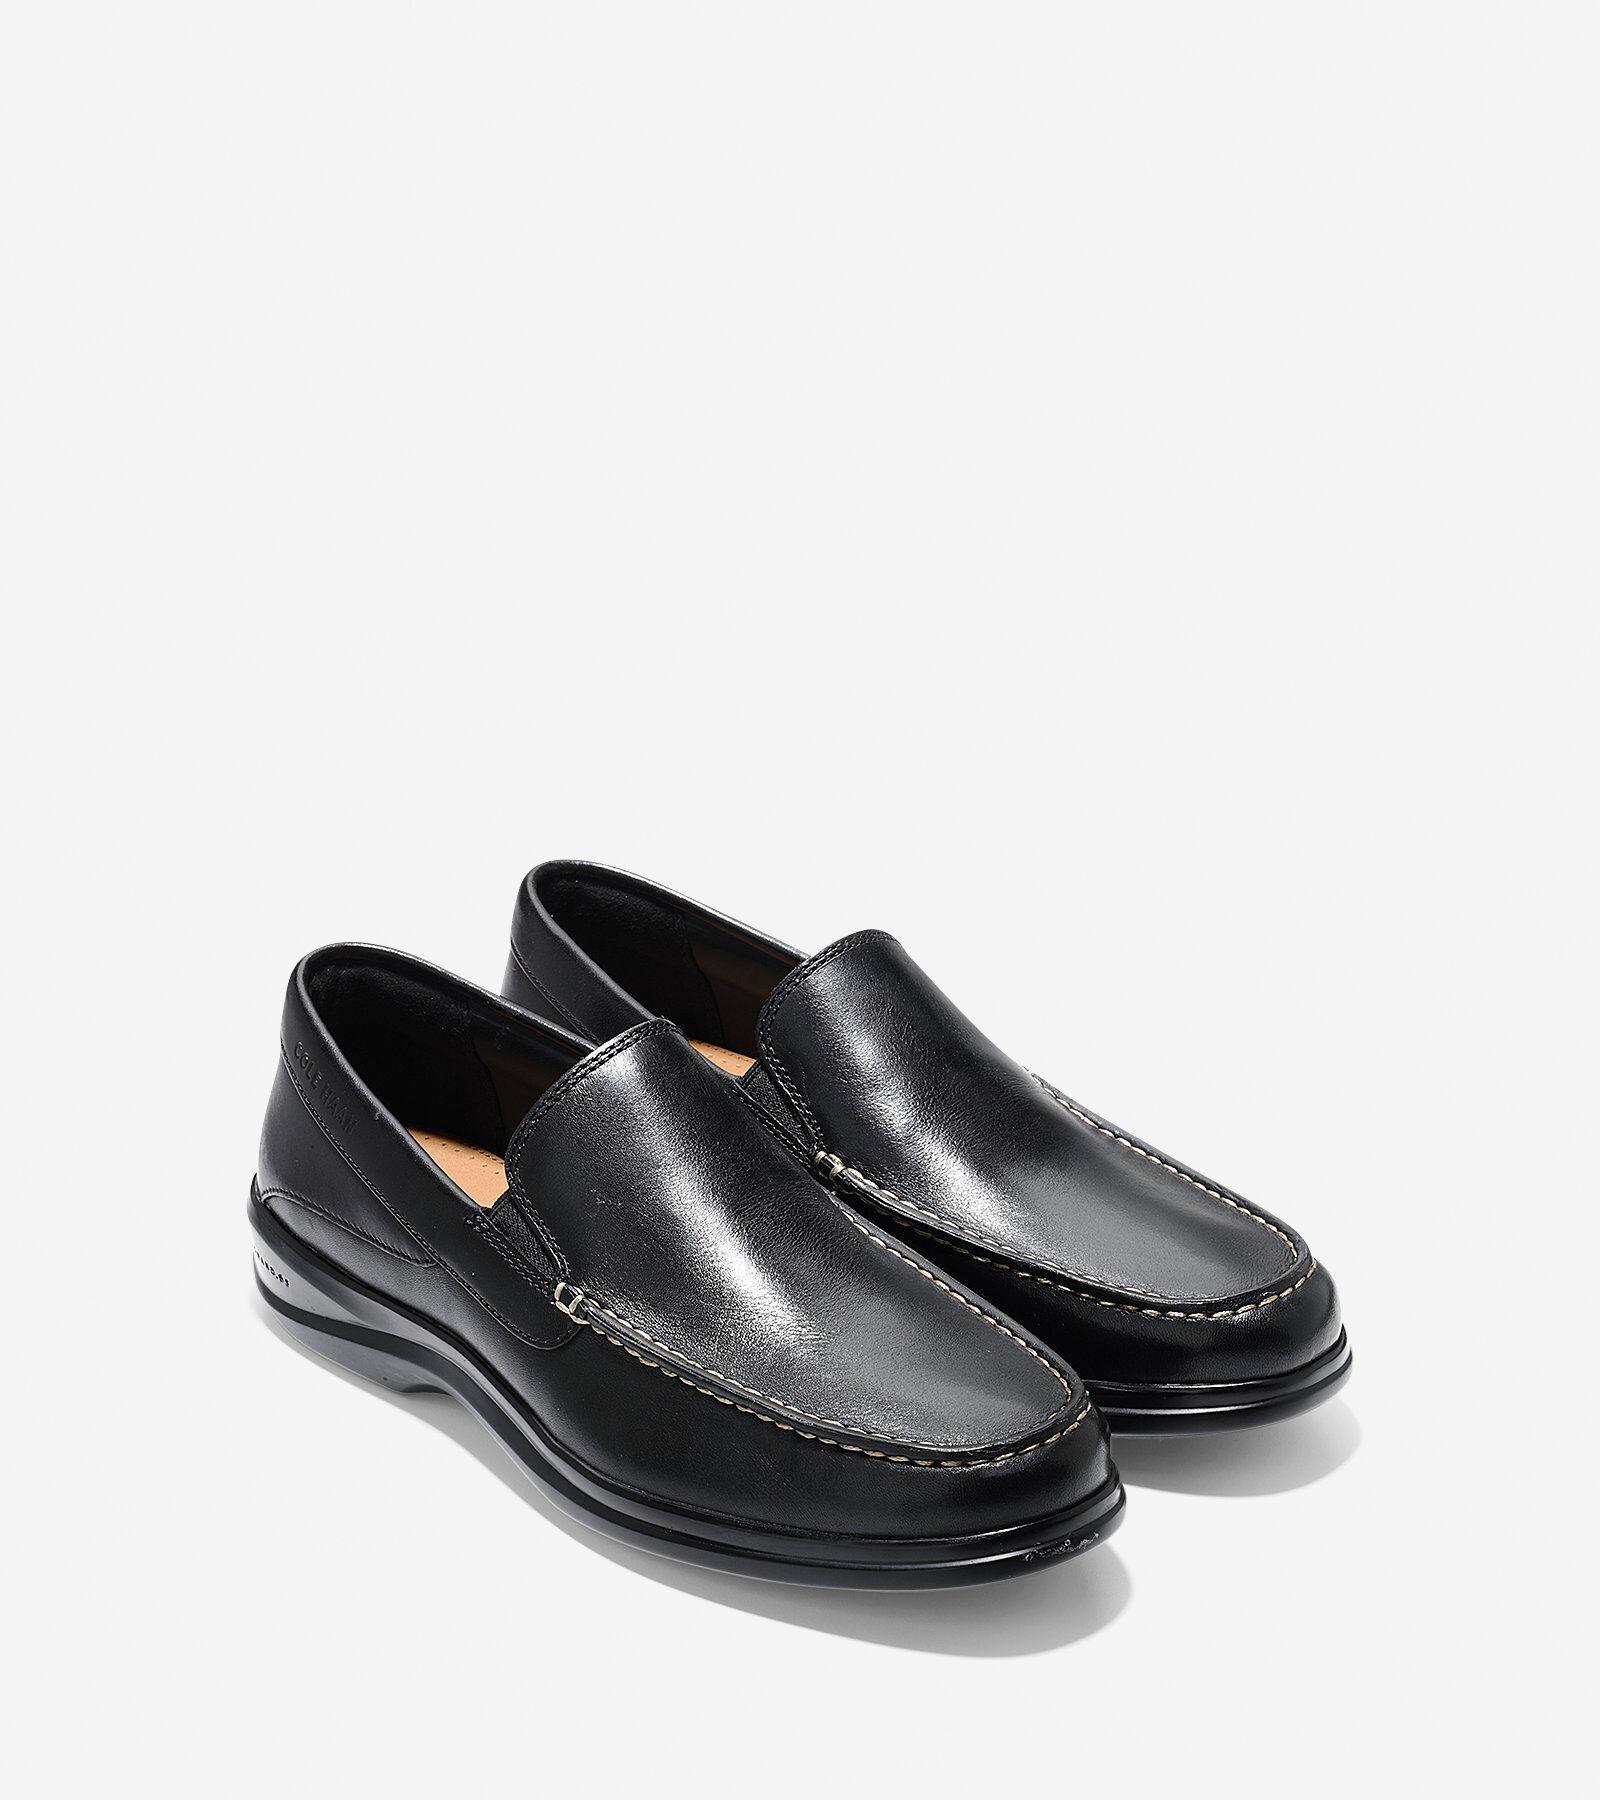 Santa Barbara Twin Gore Loafer in Black